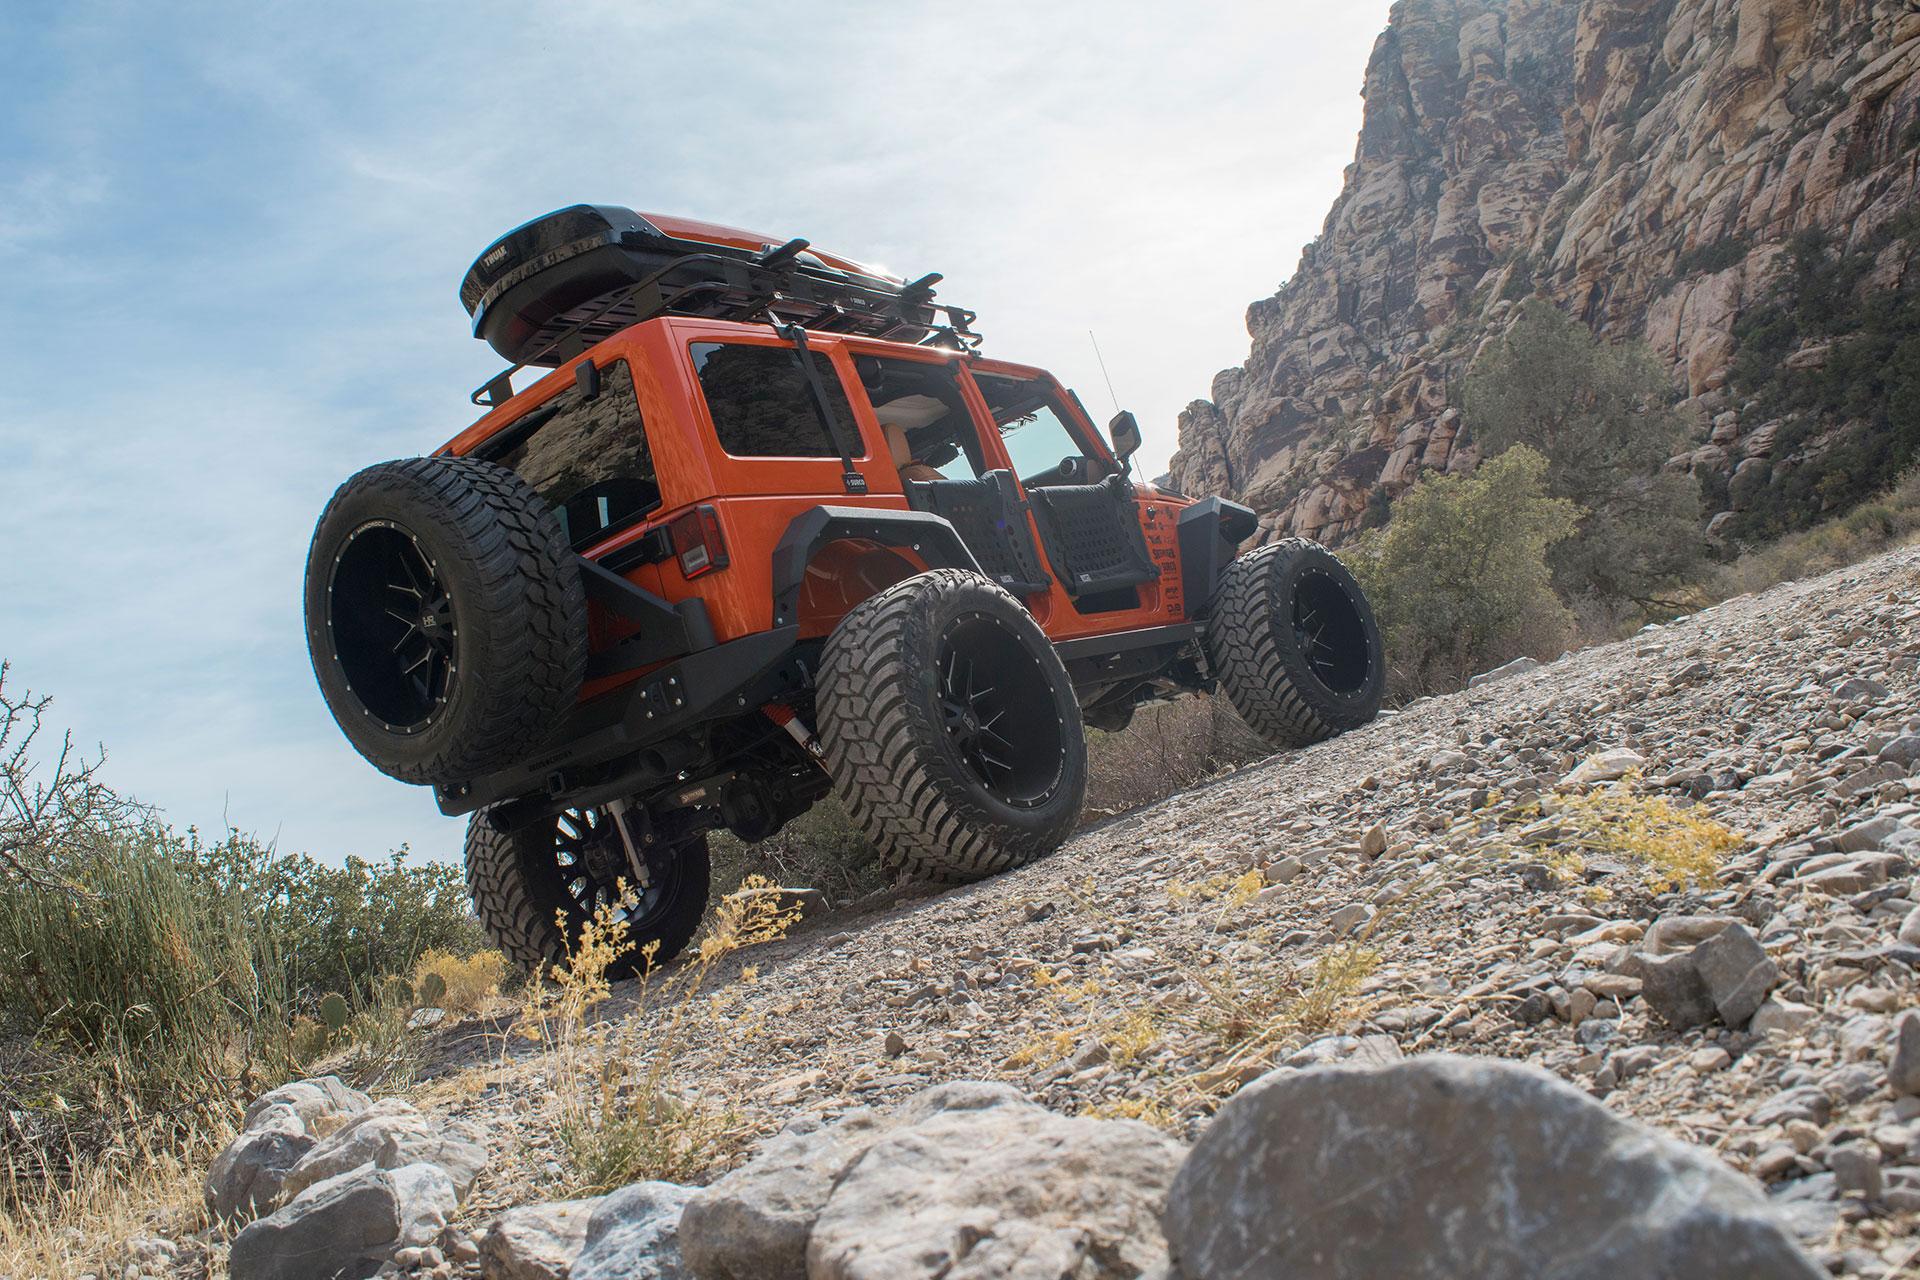 Hardrock 24x14 Affliction Wheels on an Orange Jeep Wrangler